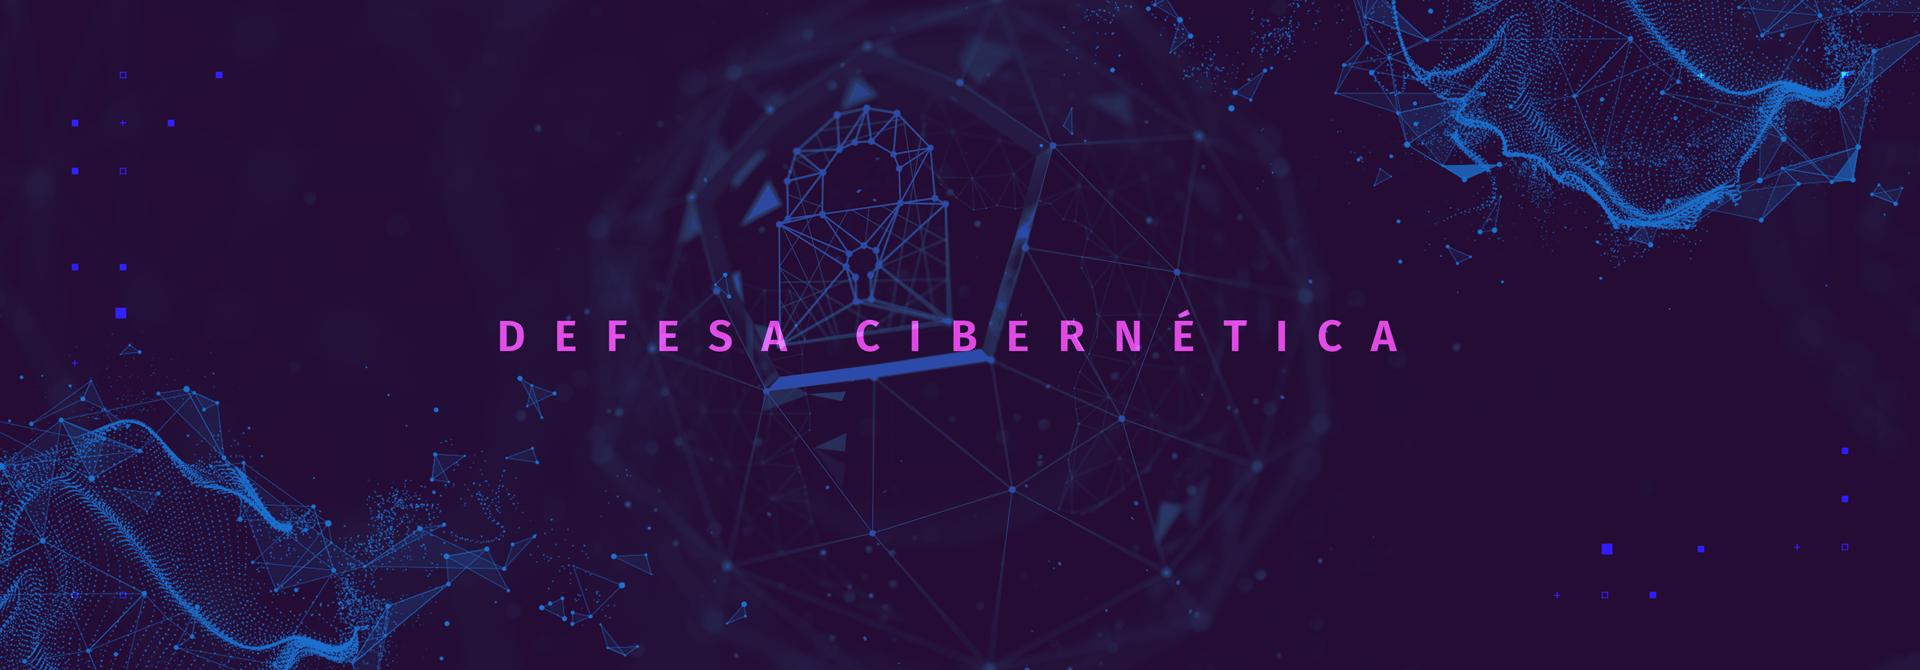 Defesa Cibernética - Graduação UVV On